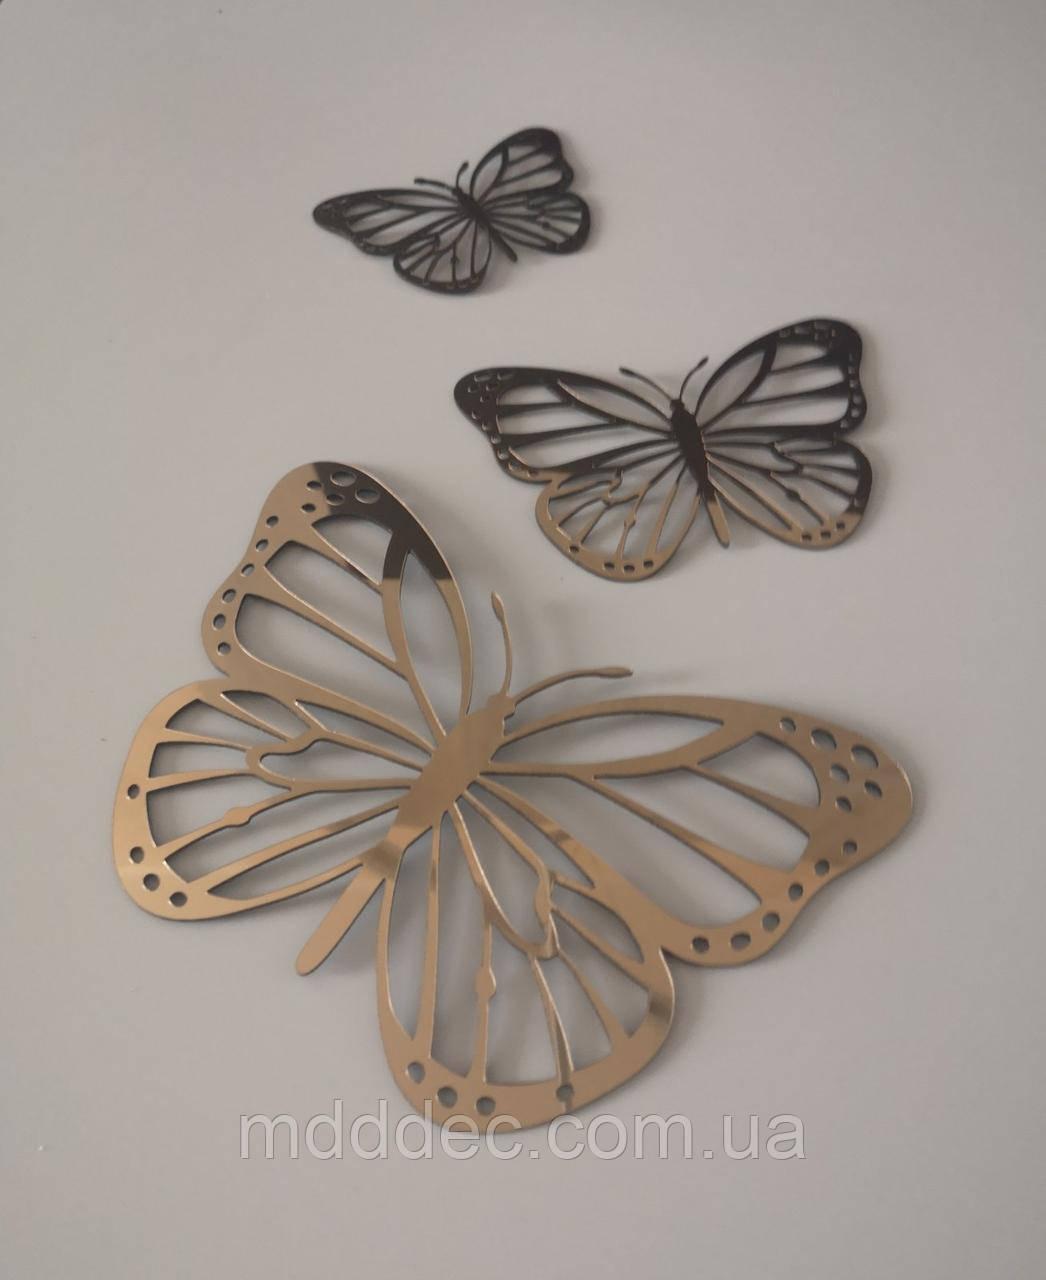 Набор зеркальный пластик золото бабочек 3 шт